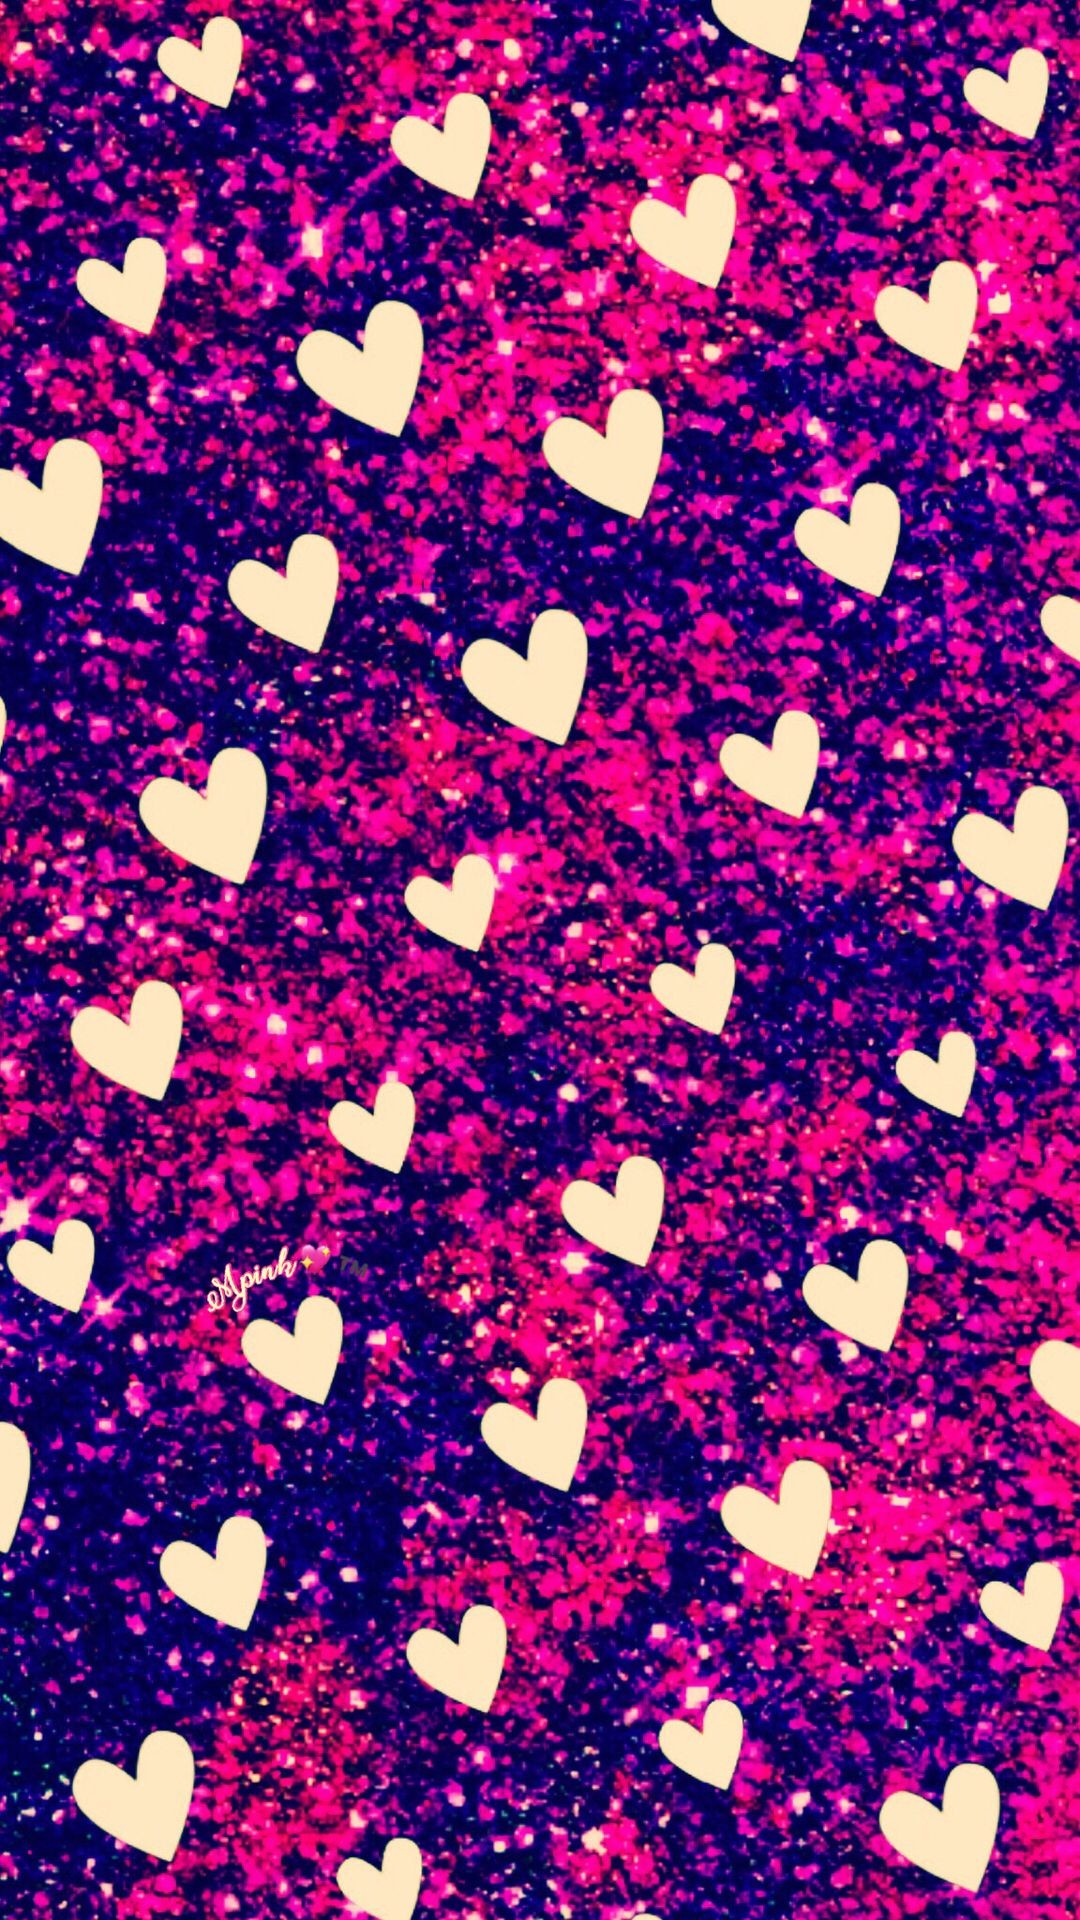 Galaxy Unicorn Glitter Cute Wallpapers Download Free